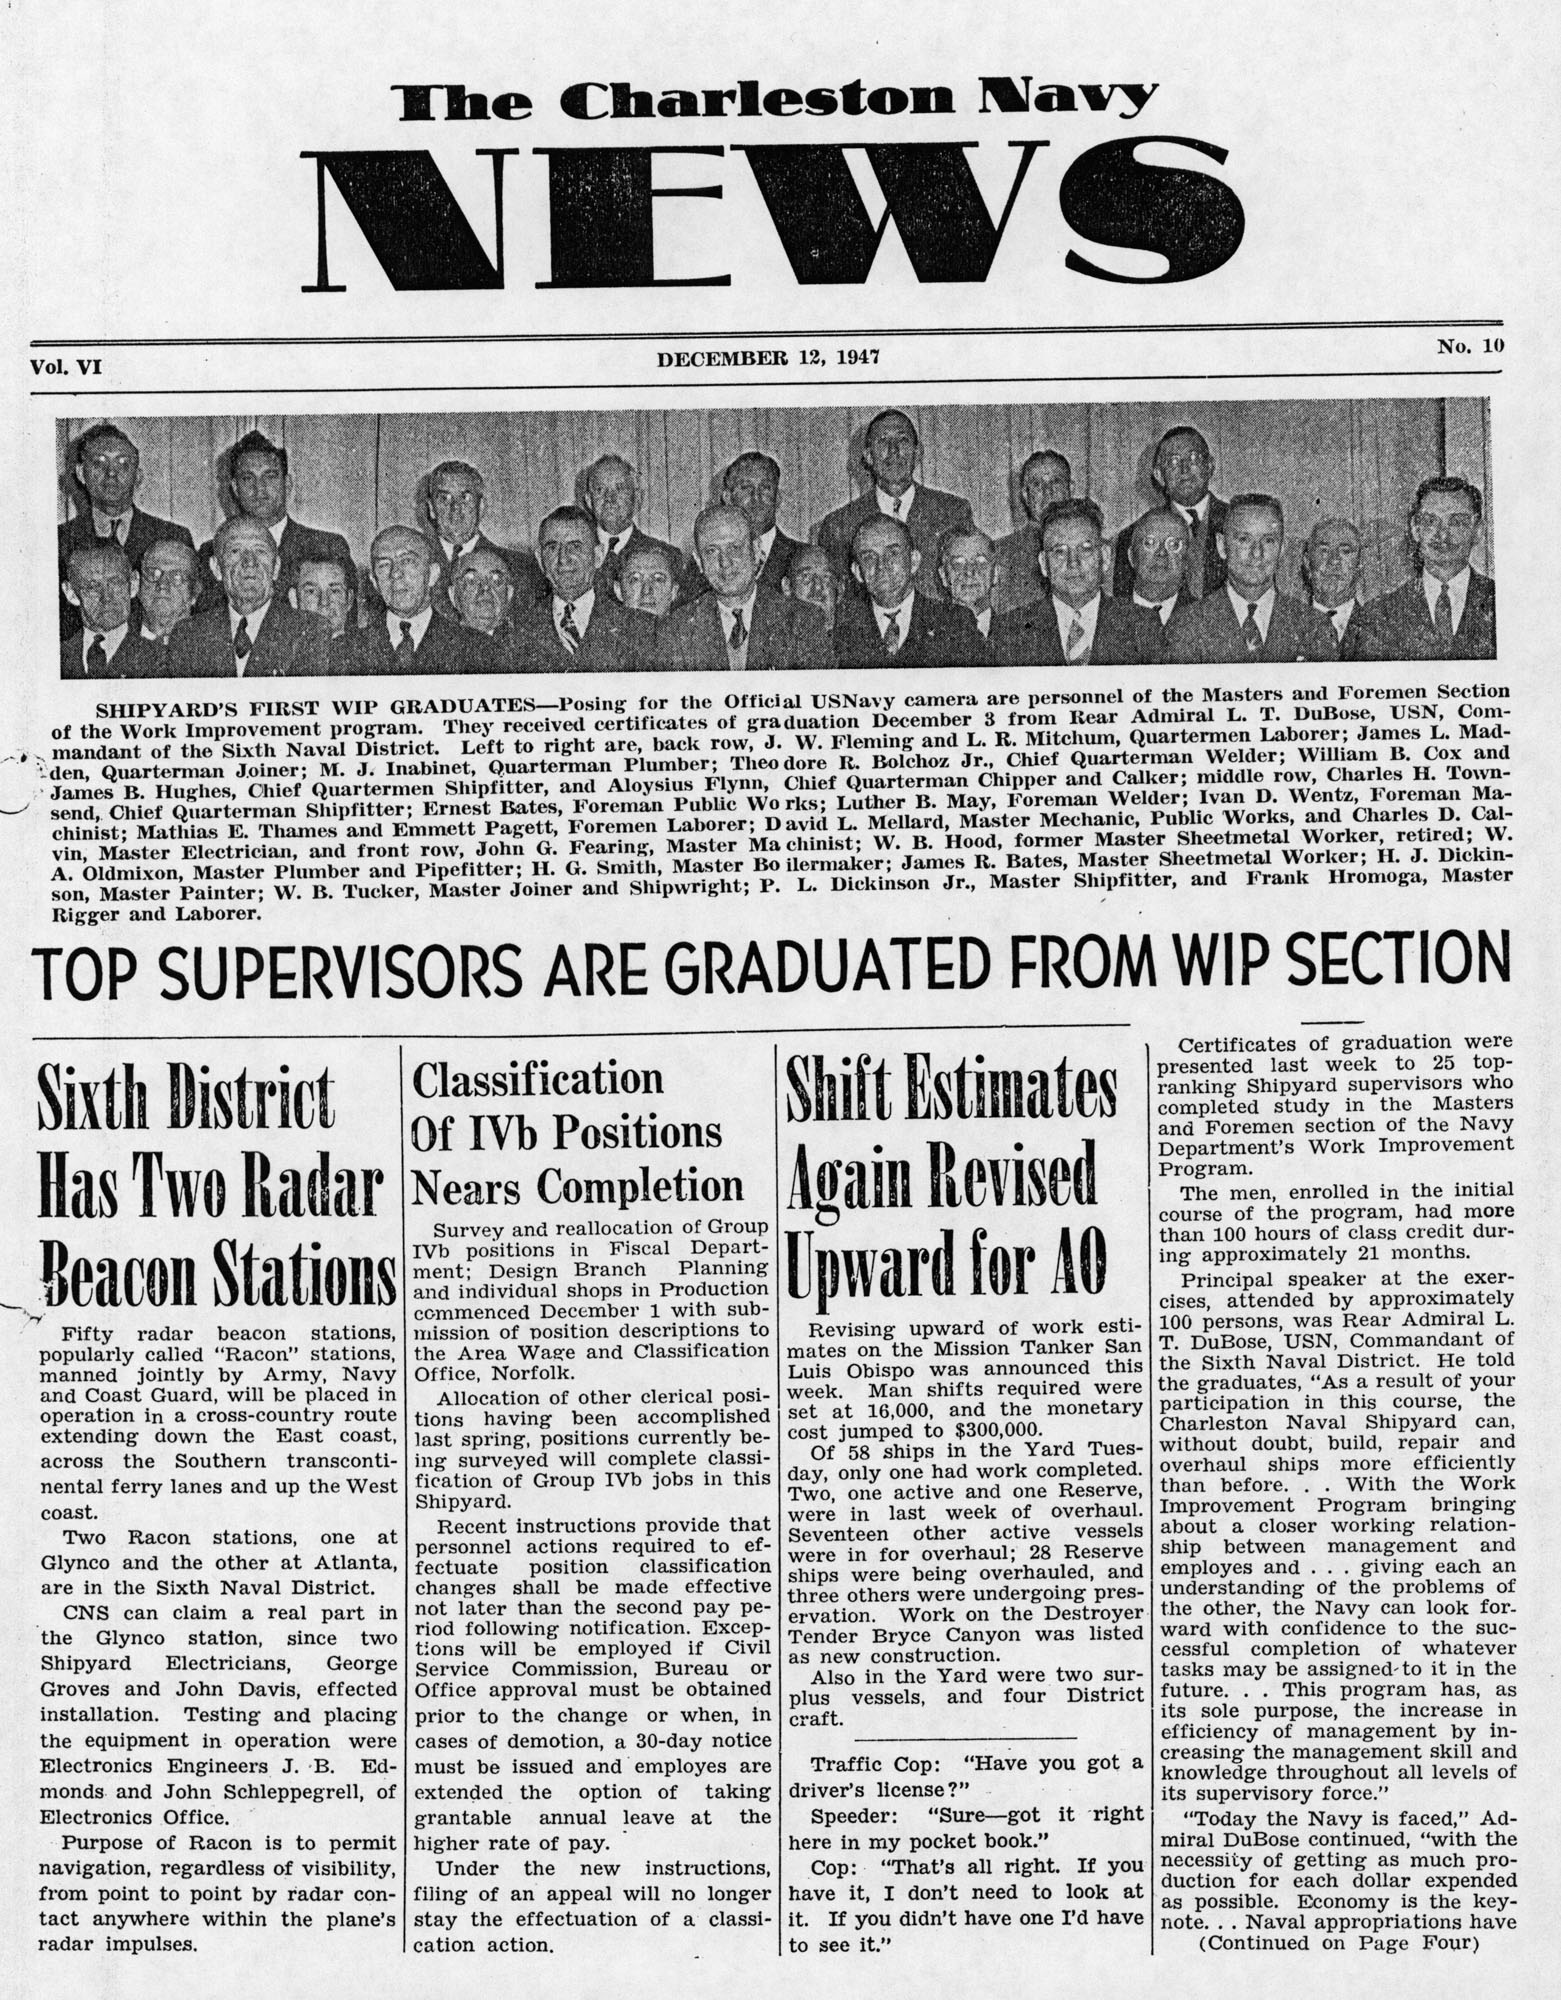 The Charleston Navy News, Volume 6, Edition 10, page i